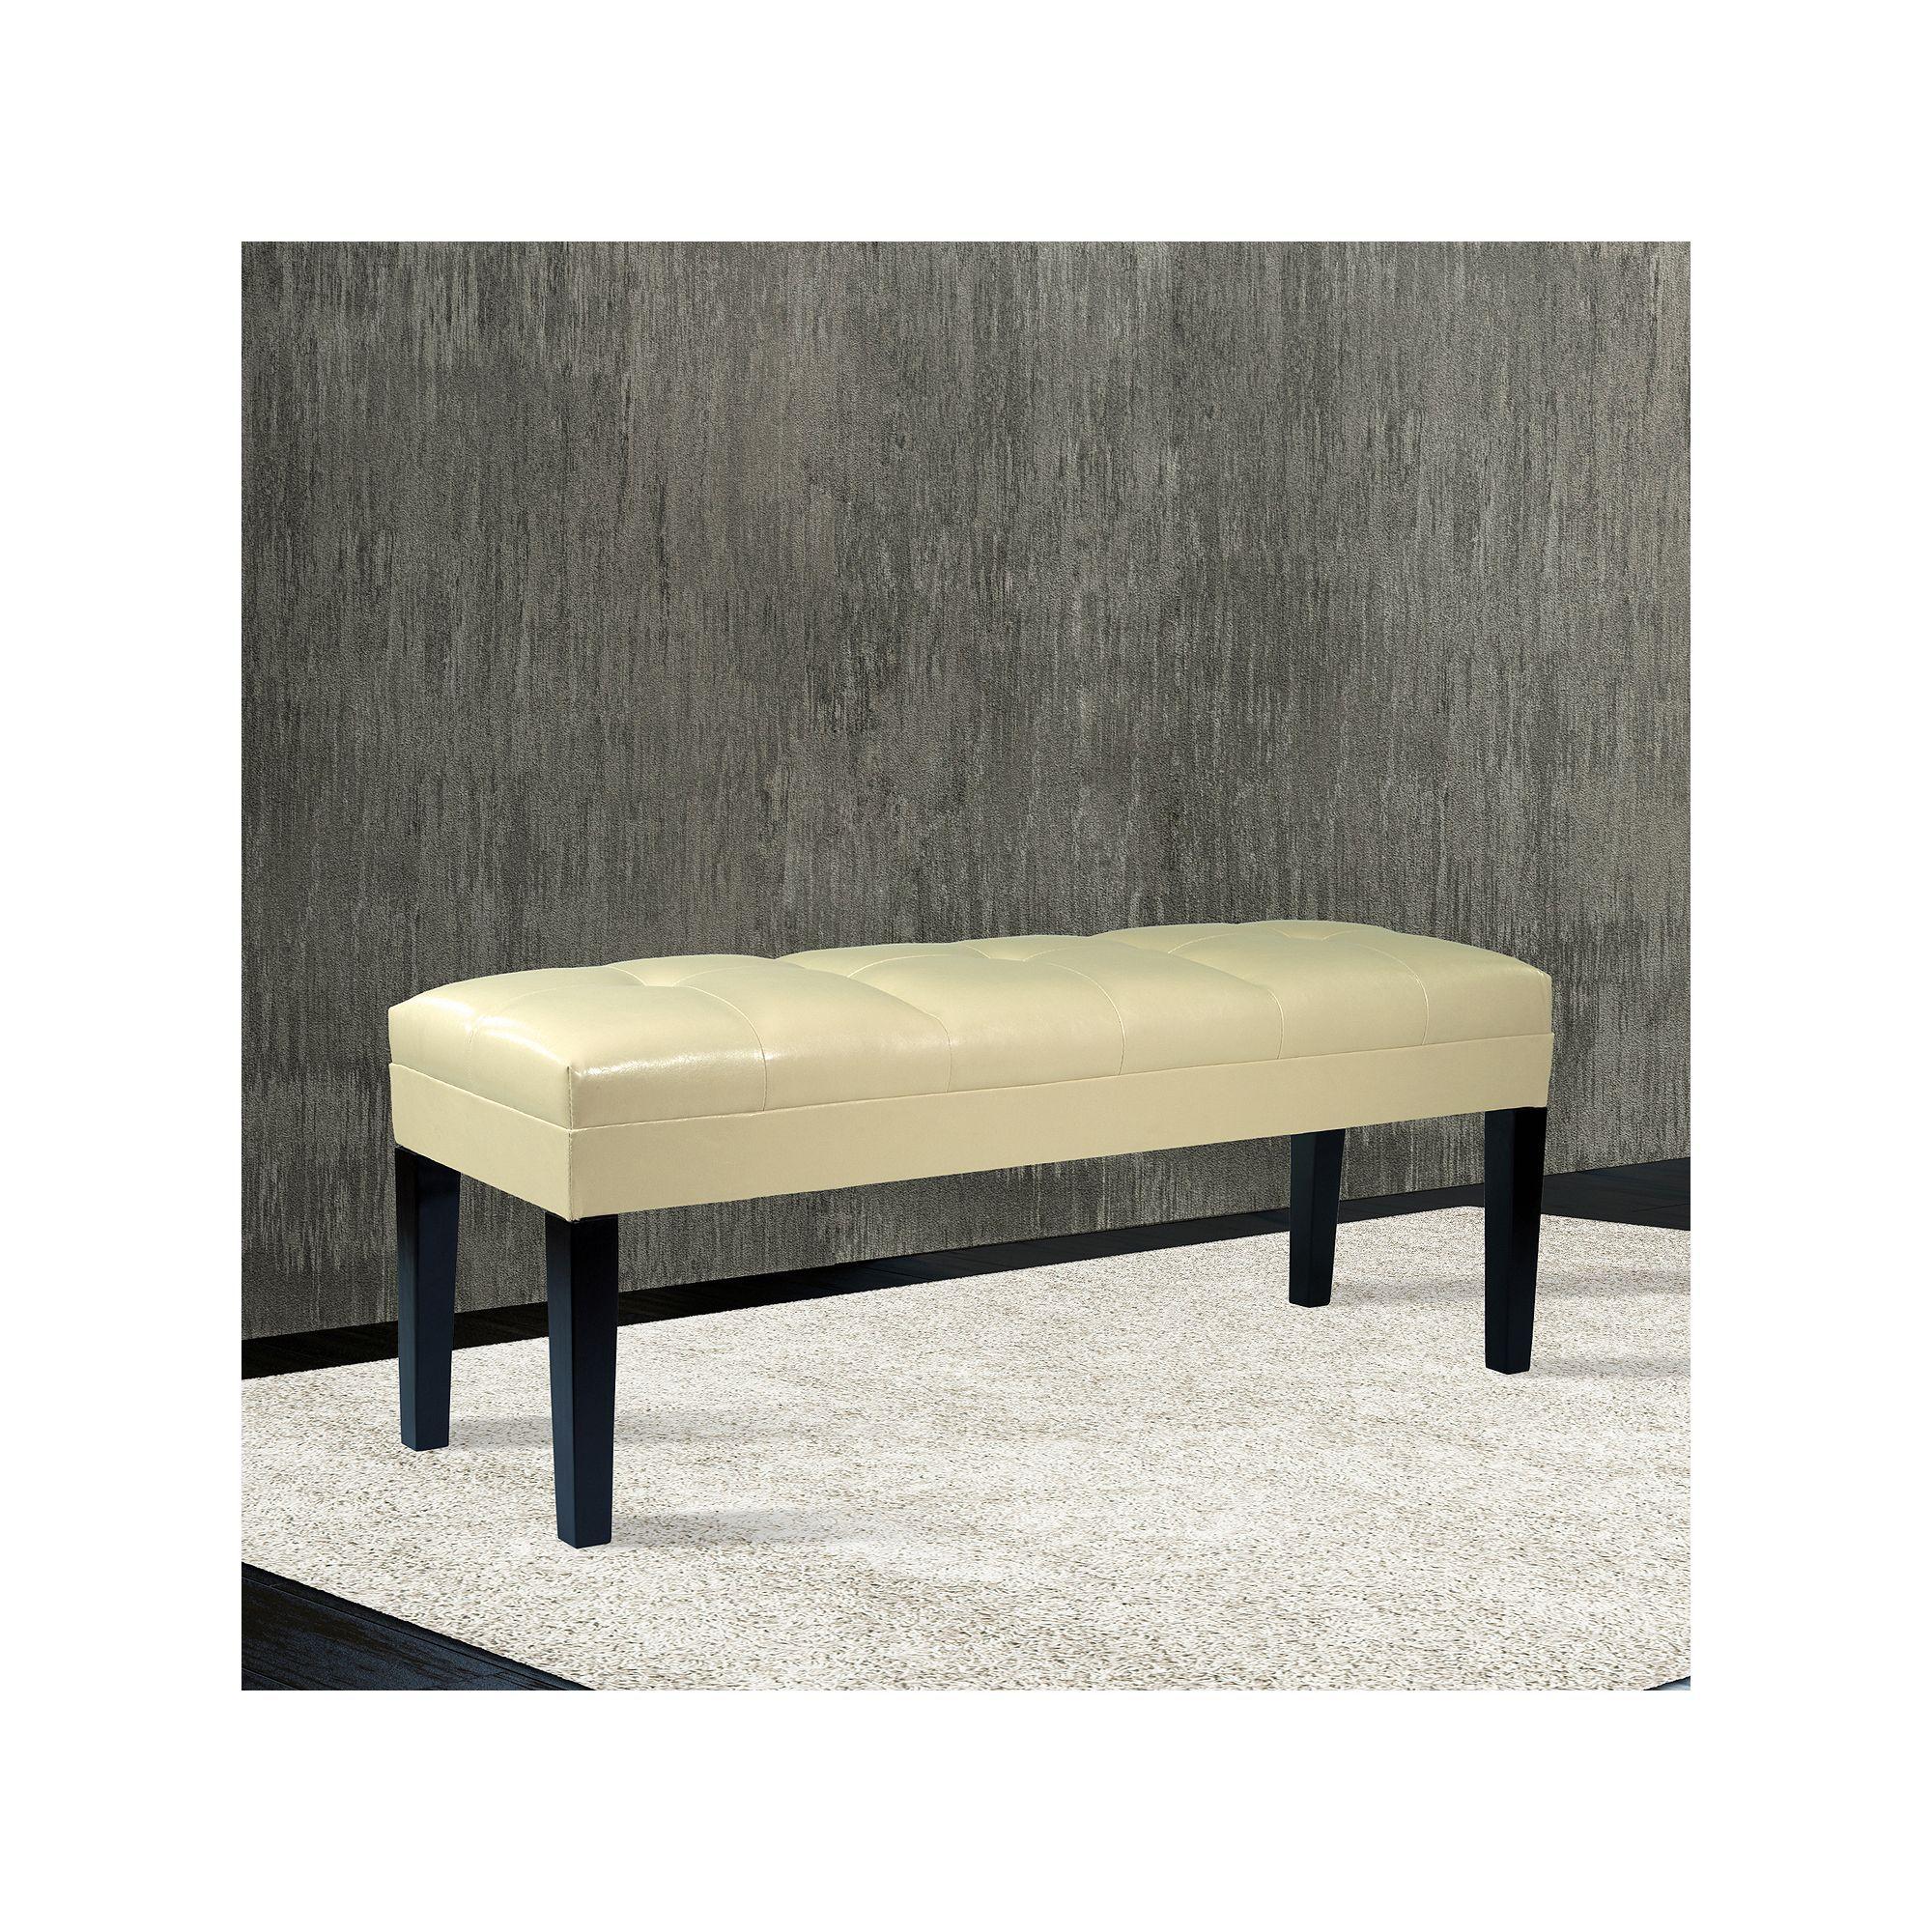 Sensational Armen Living Salia Bench Products Leather Bench Tufted Inzonedesignstudio Interior Chair Design Inzonedesignstudiocom